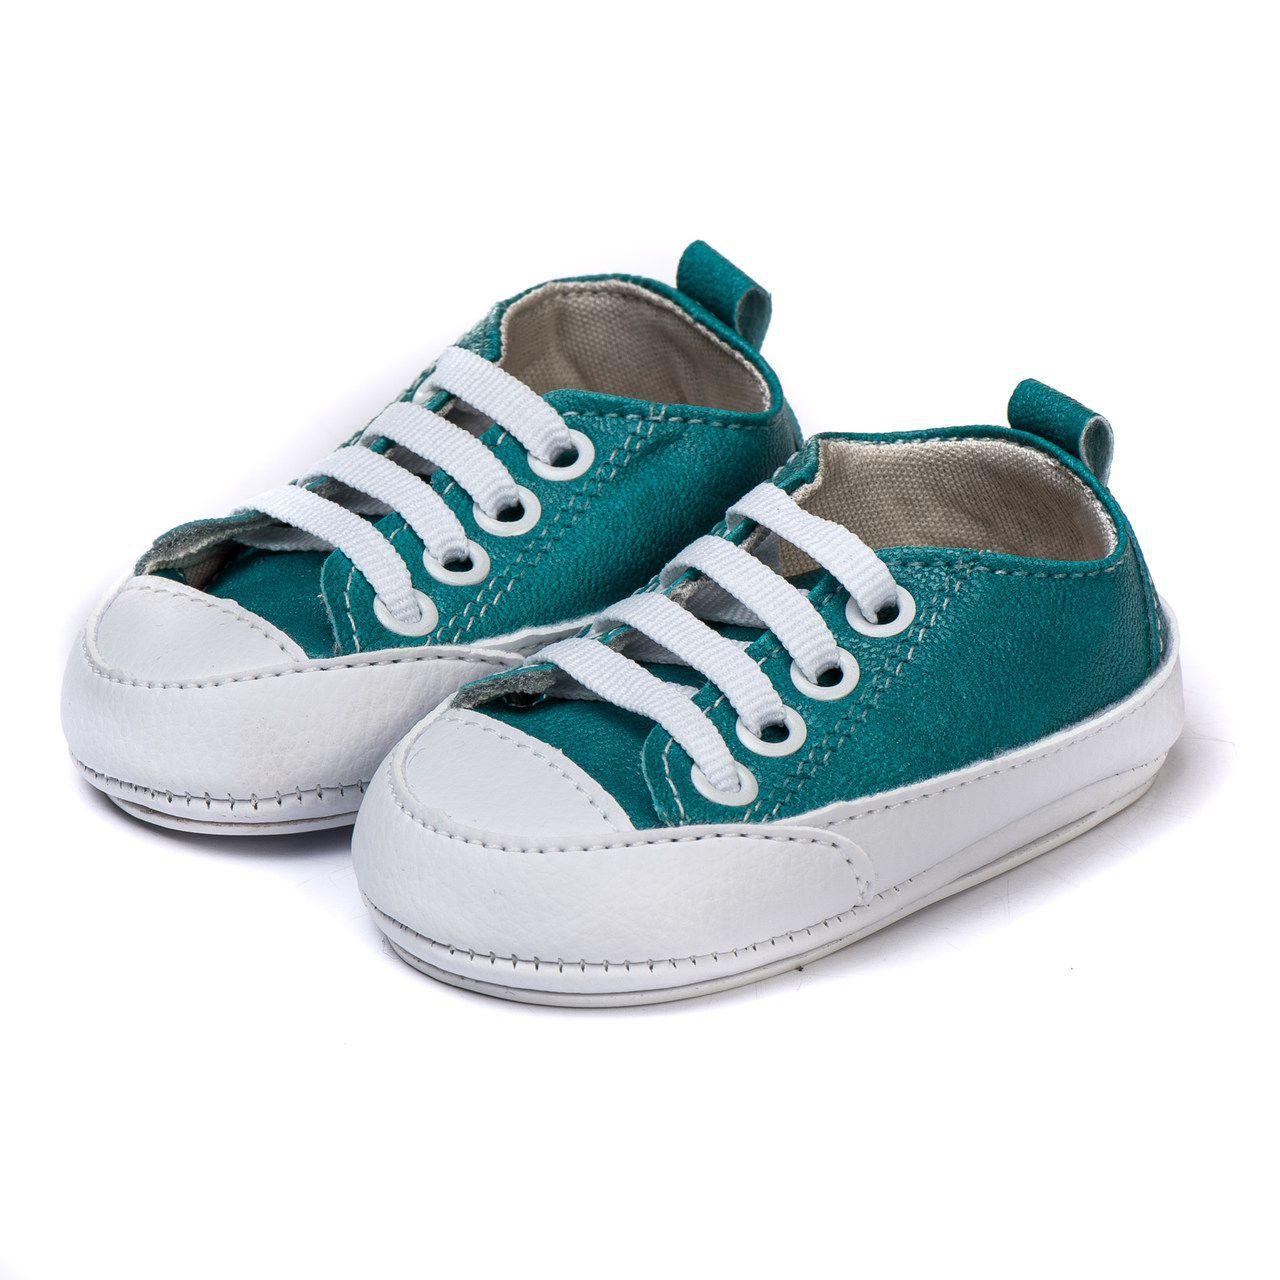 Tênis Bebe Kapell Infantil Verde e Branco